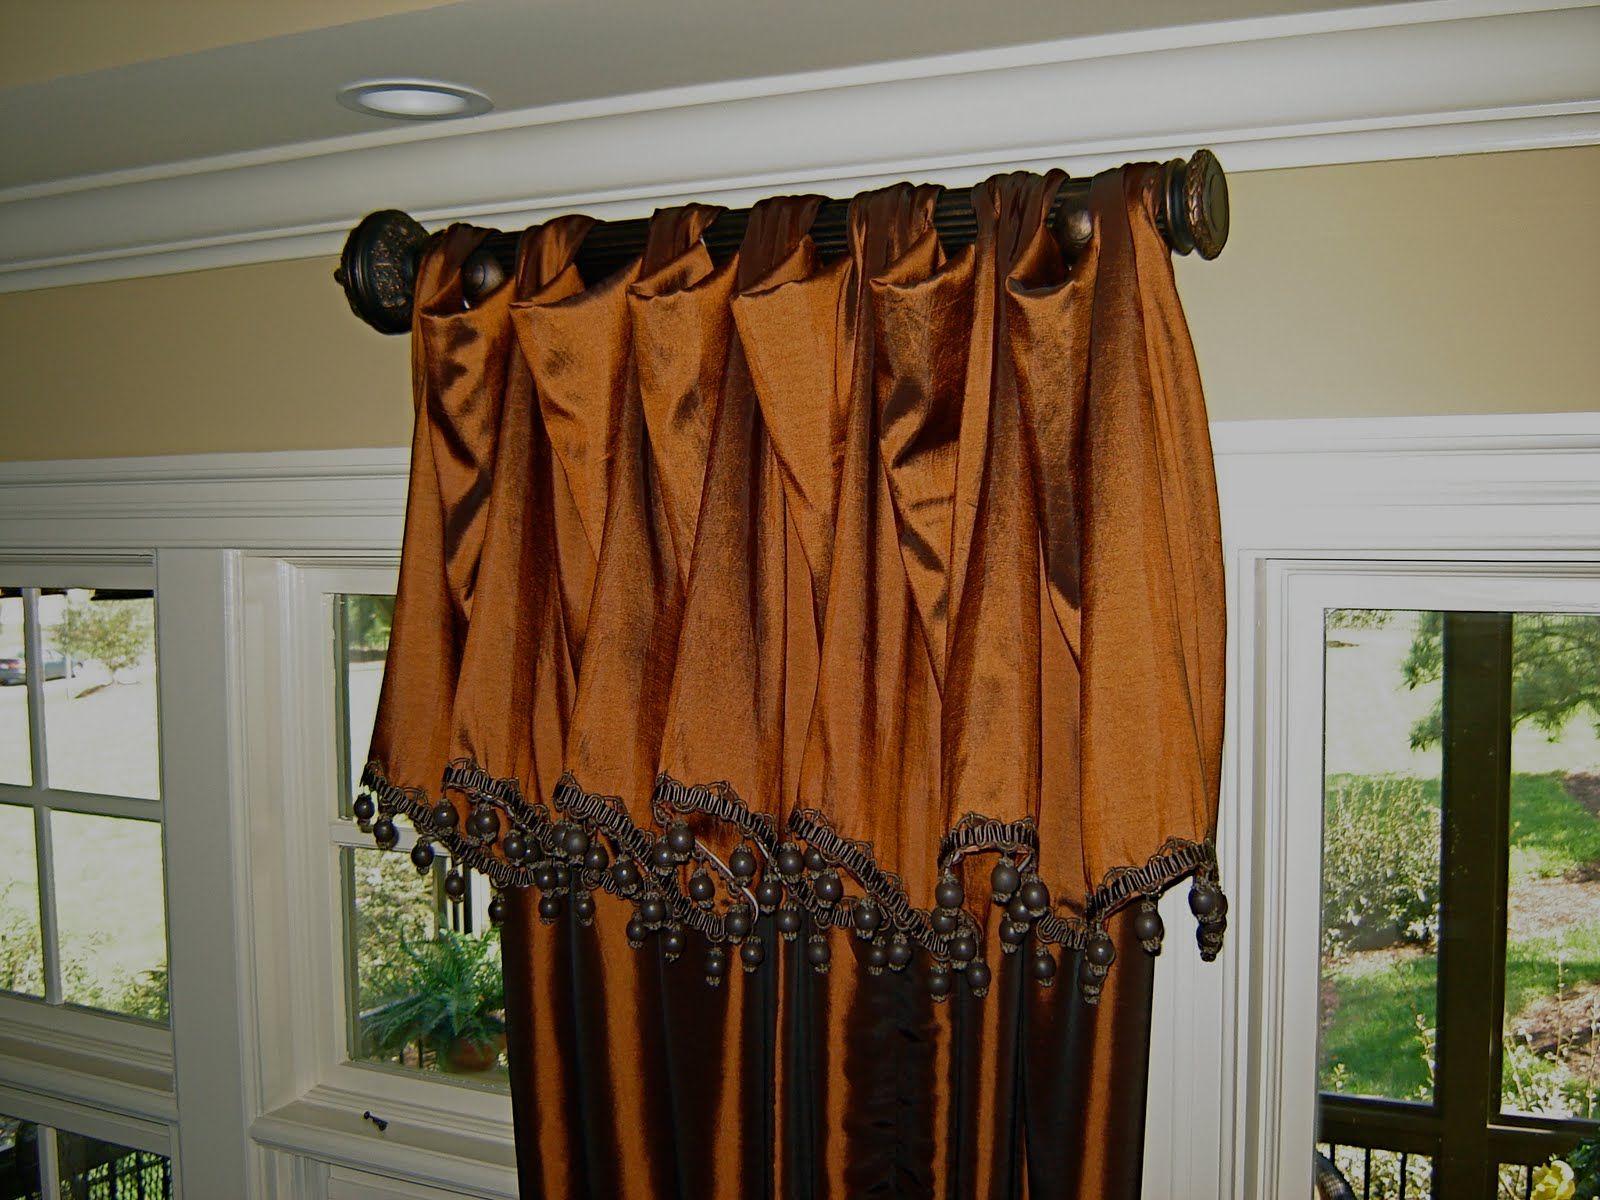 images about window treatments on pinterest hunter douglas curtain ideas and roman shades - Window Treatments Ideas